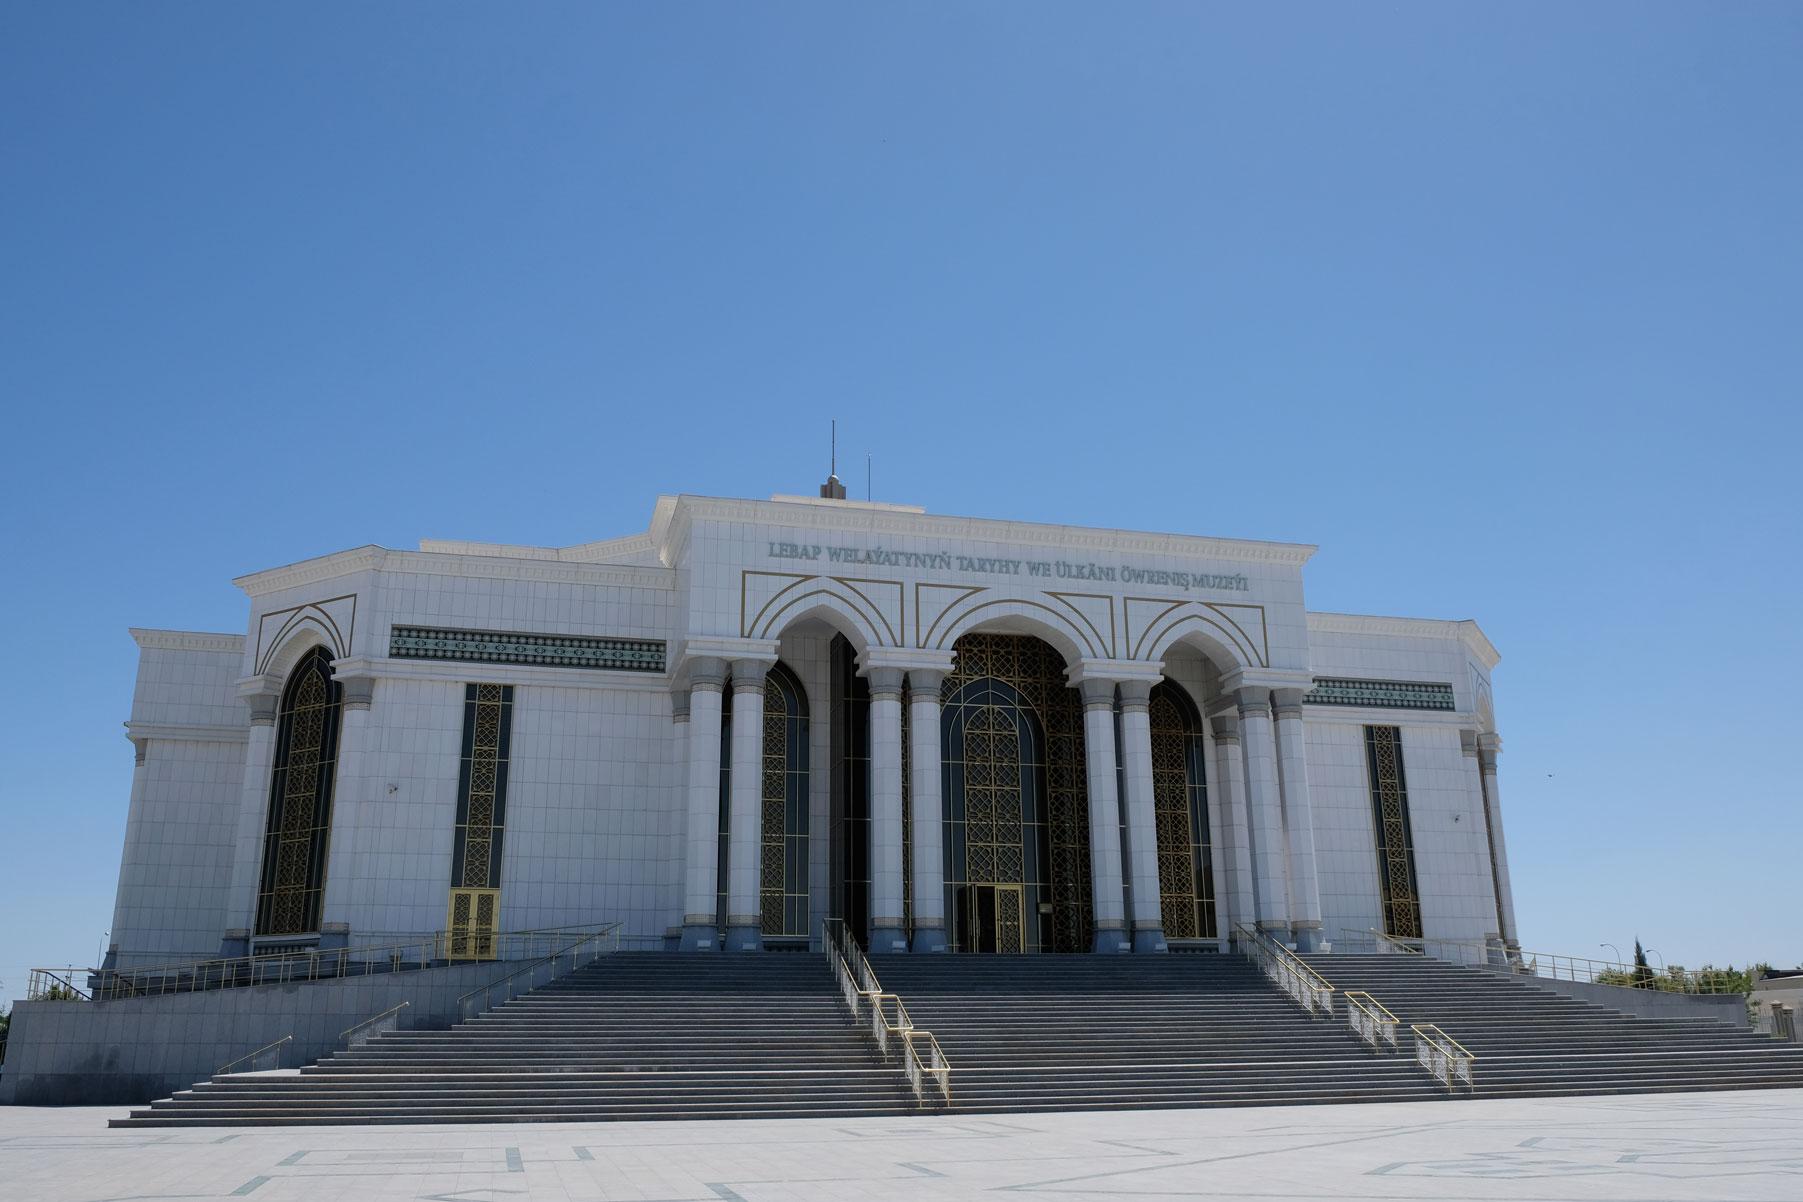 Das imposante Museumsgebäude